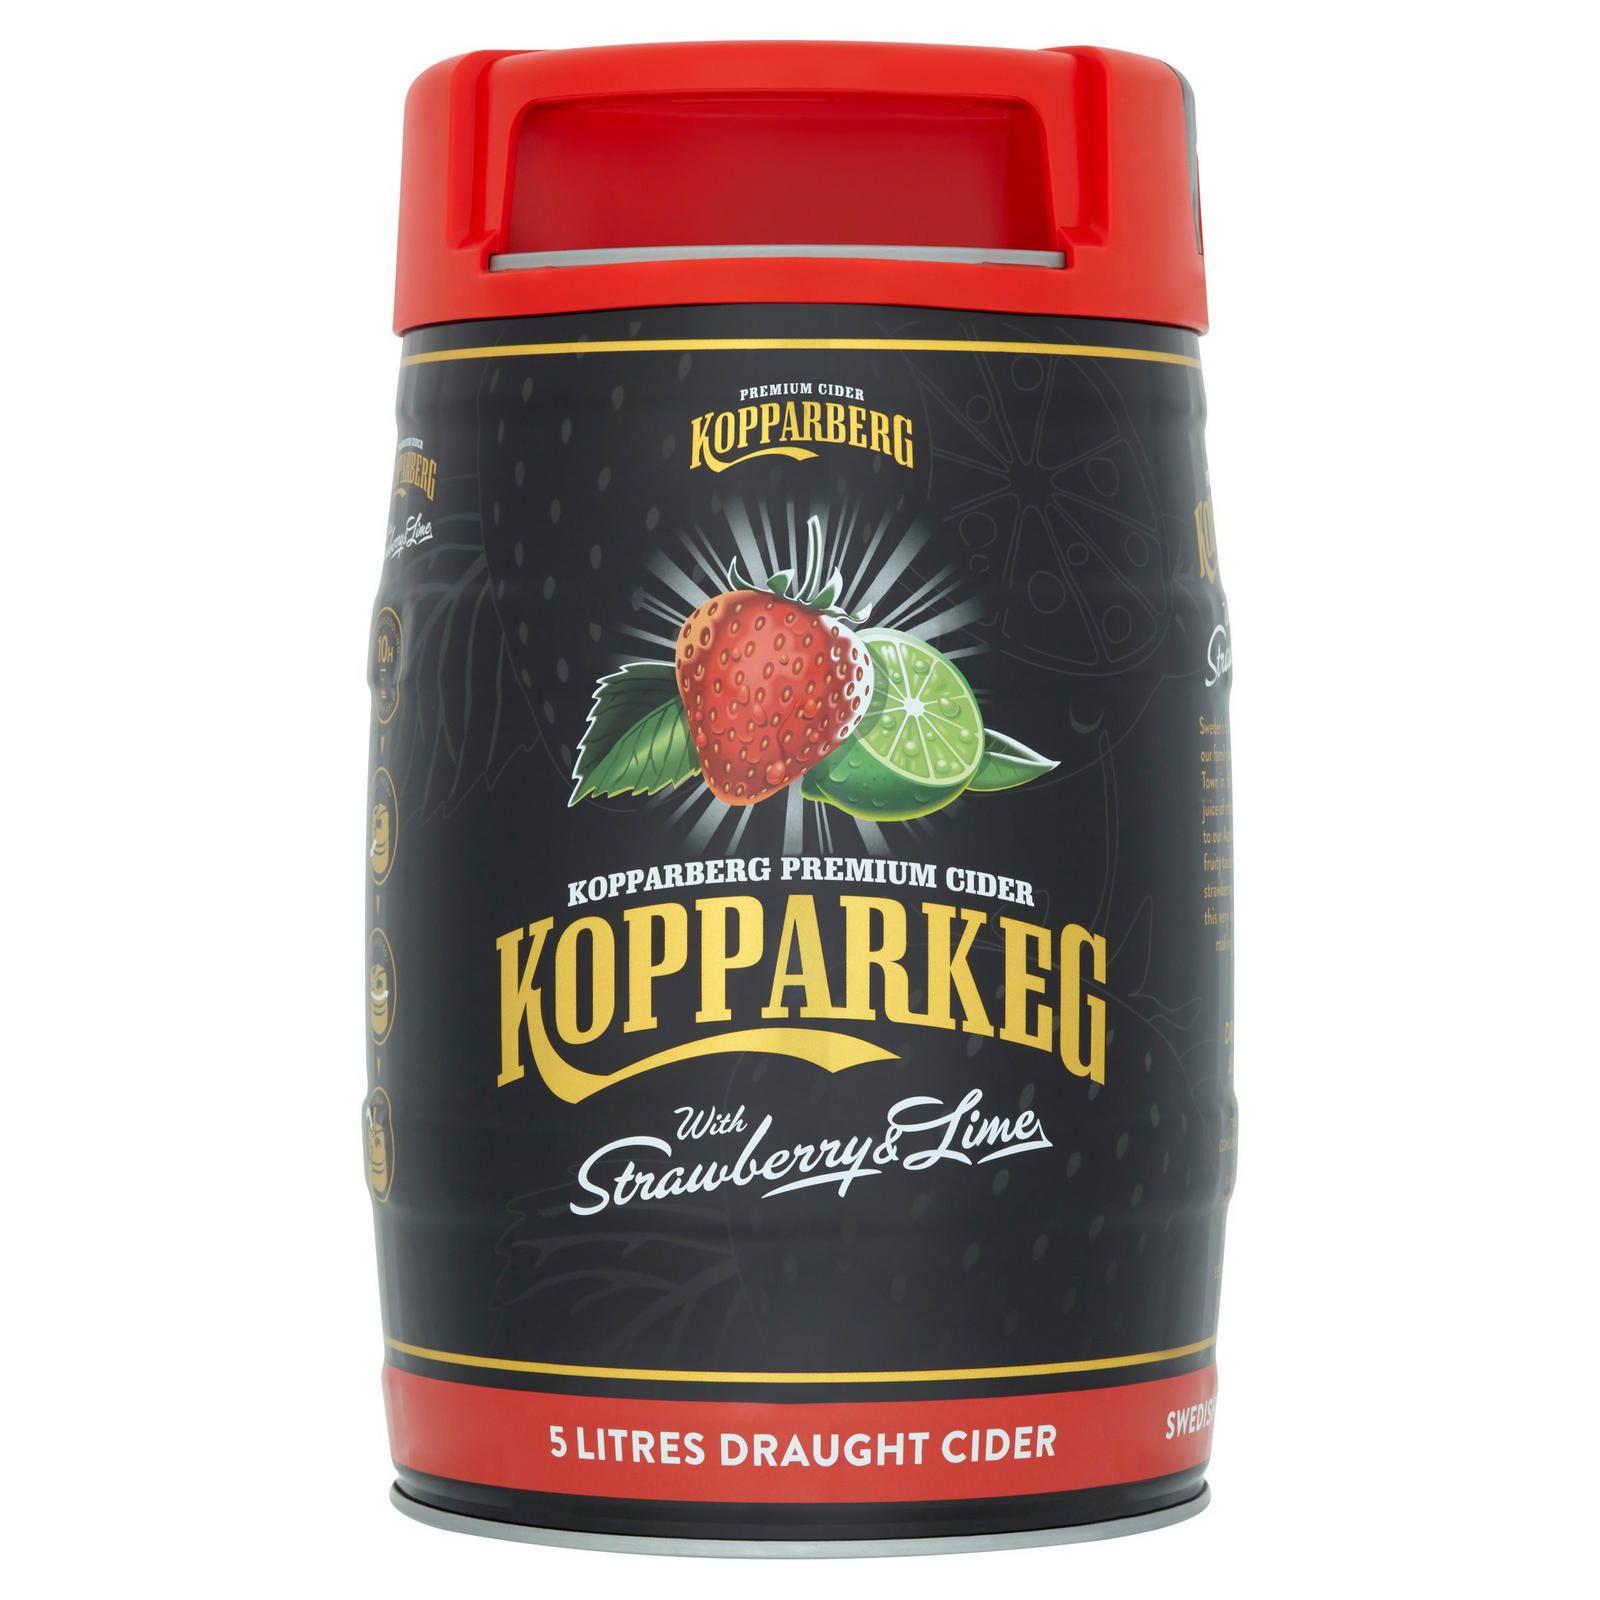 Keg (5 liters) Strawberry & Lime Kopperberg - £10 Home Bargains in store Harlow